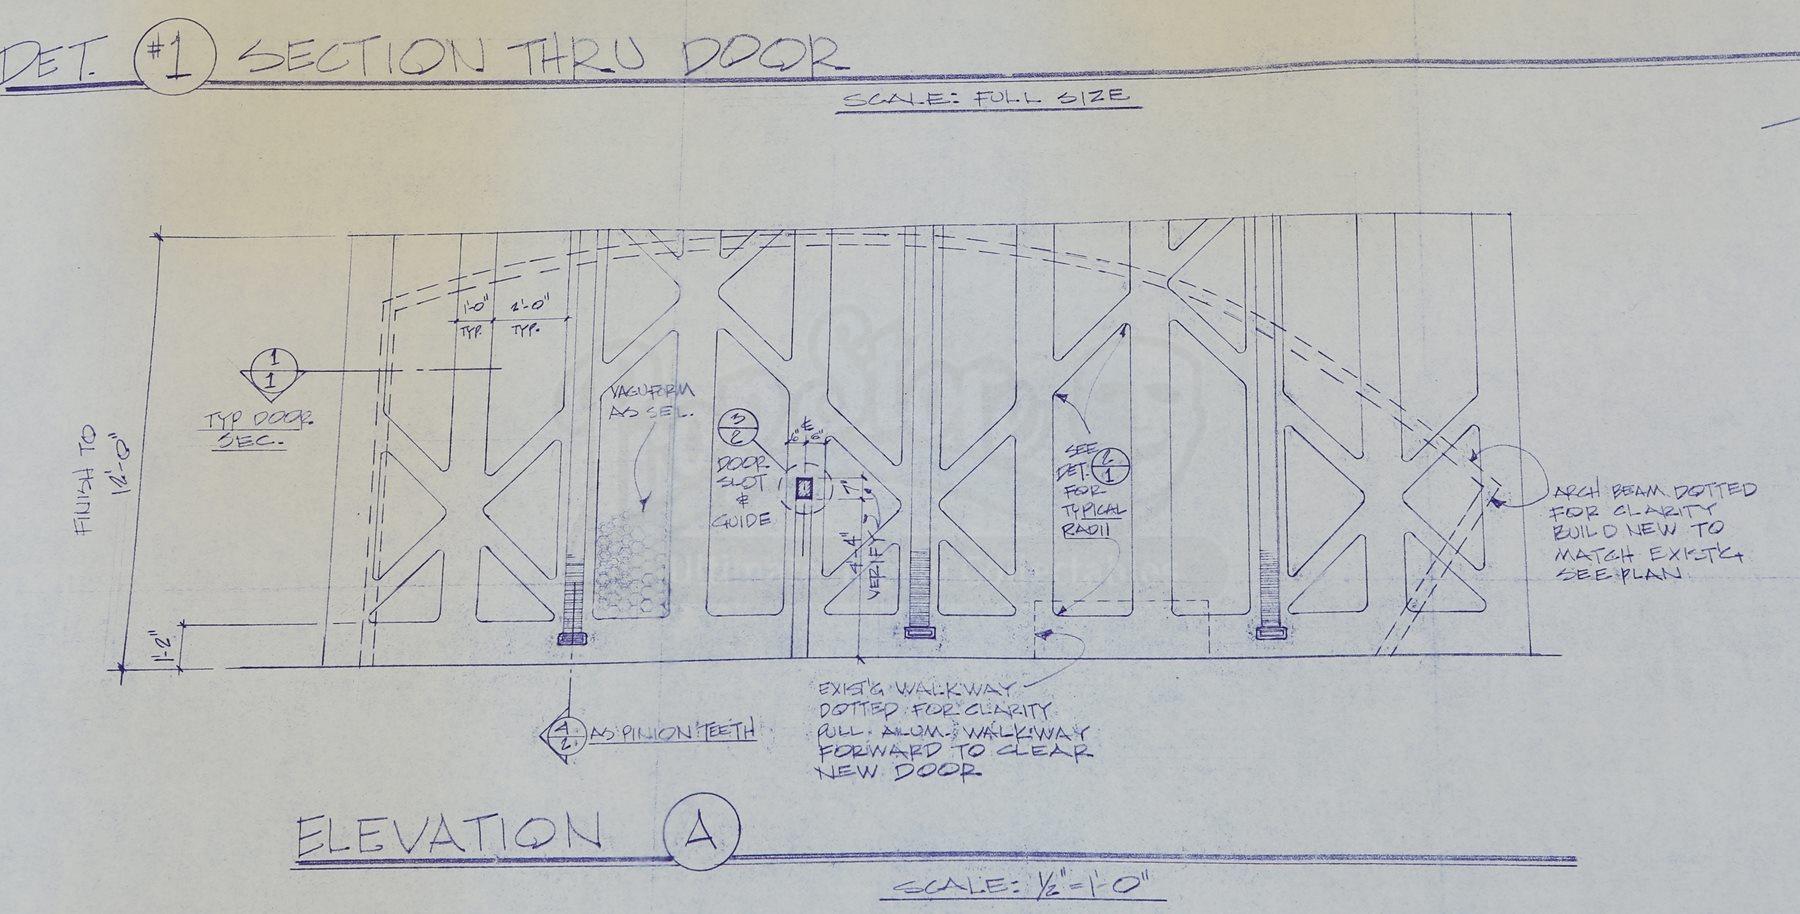 Star trek ii the wrath of khan uss enterprise ncc 1701 for Blueprint cost